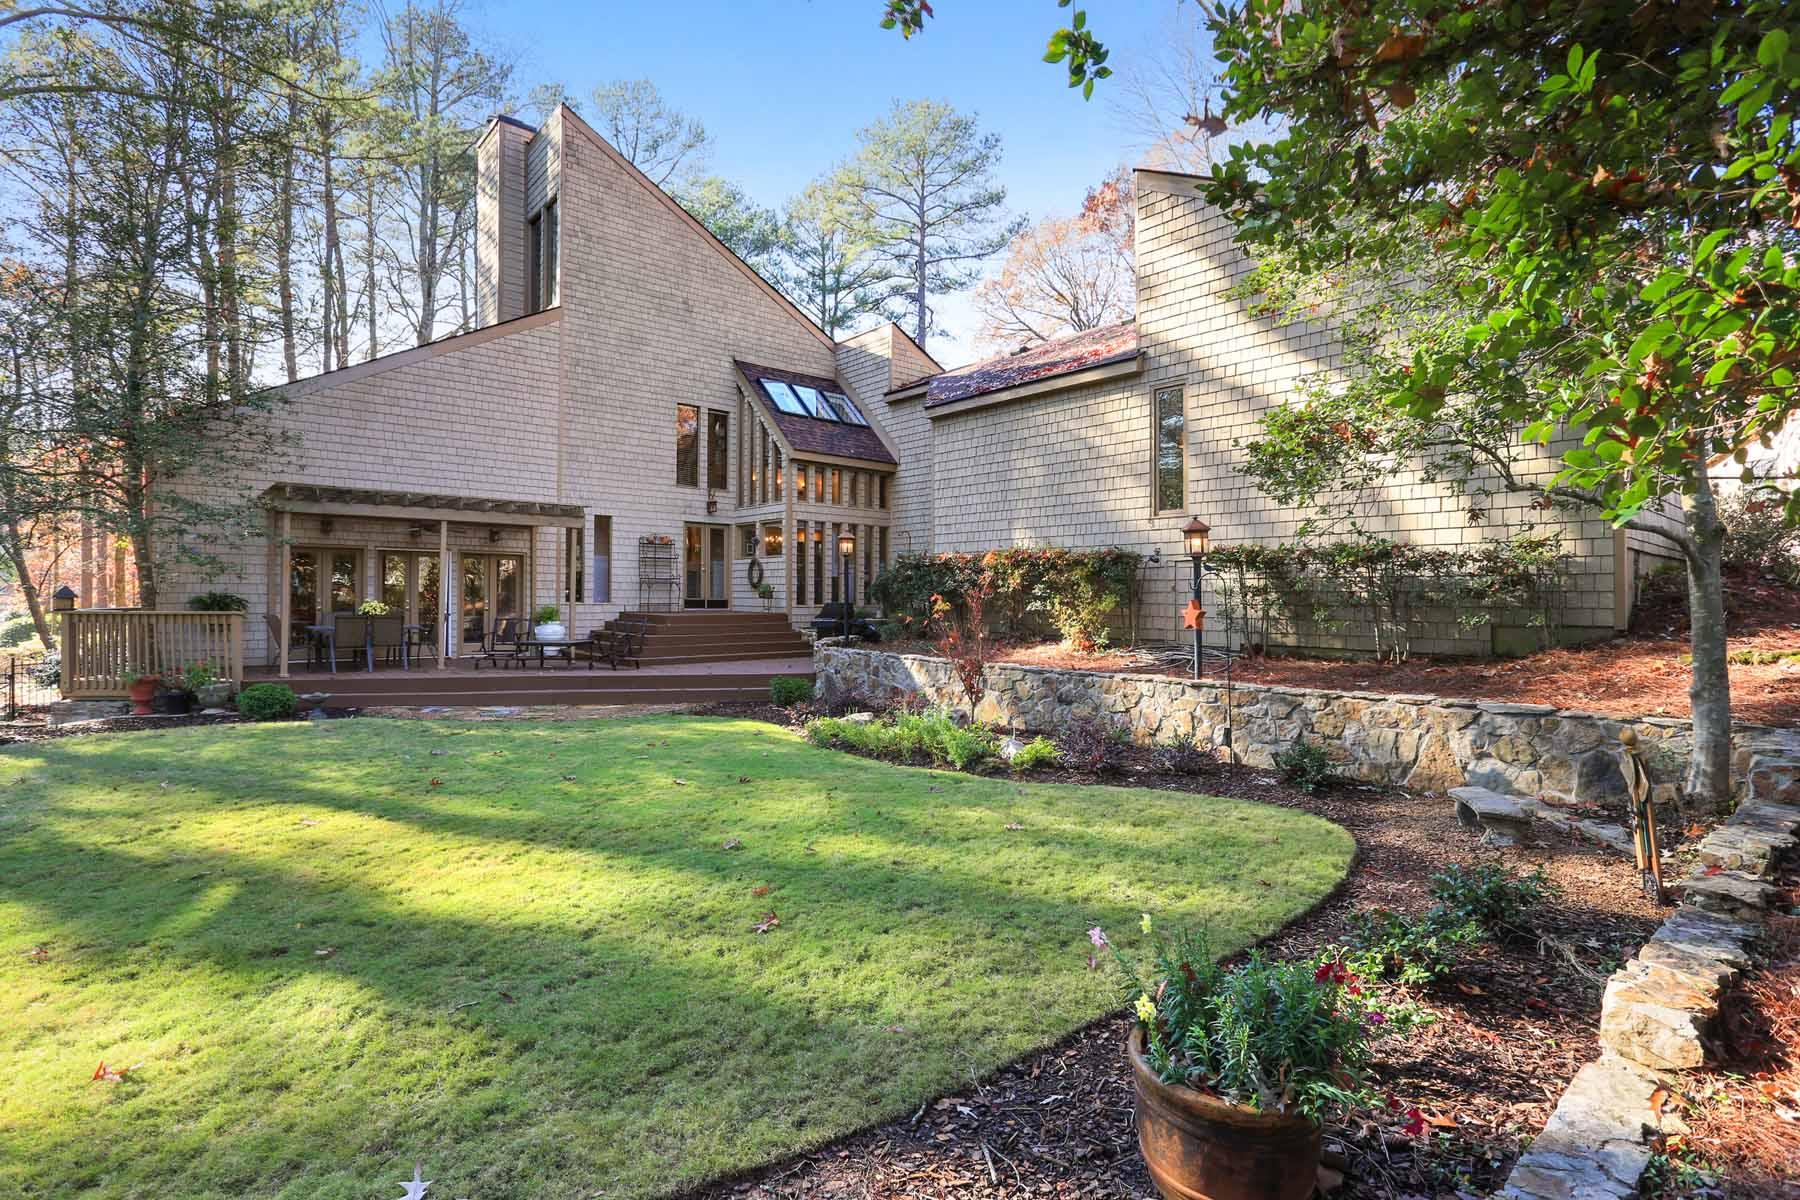 獨棟家庭住宅 為 出售 在 Private Mountain-Like Retreat 7945 Saddleridge Drive Sandy Springs, 喬治亞州, 30350 美國